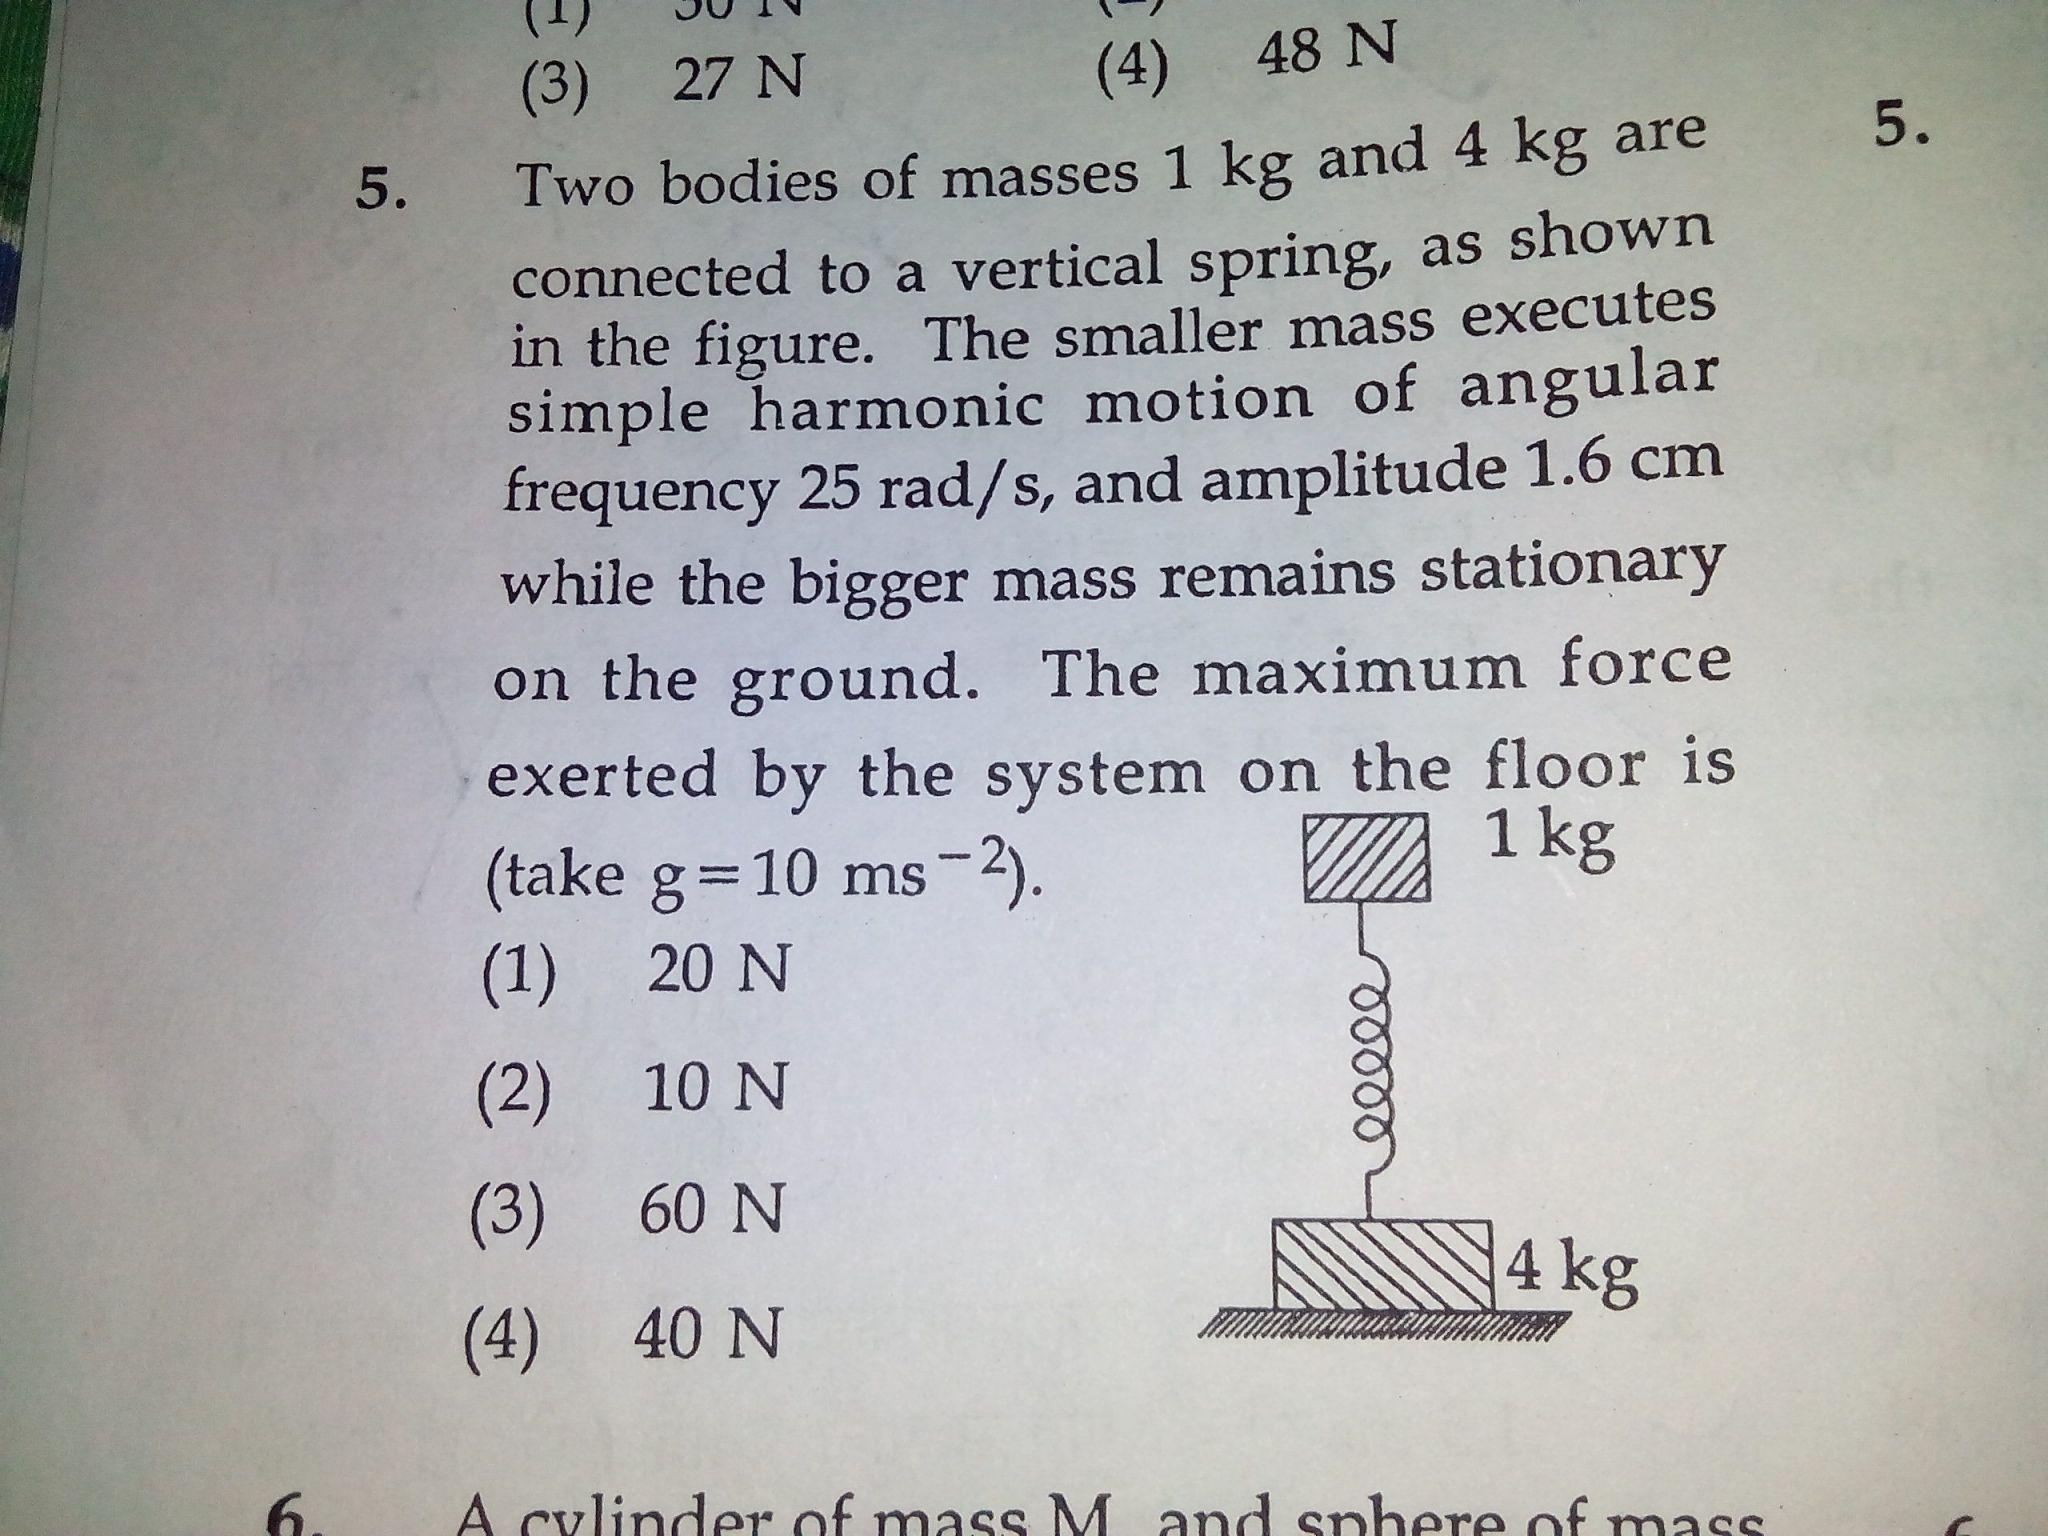 Momentum Impulse And Momentum Change Worksheet Answers